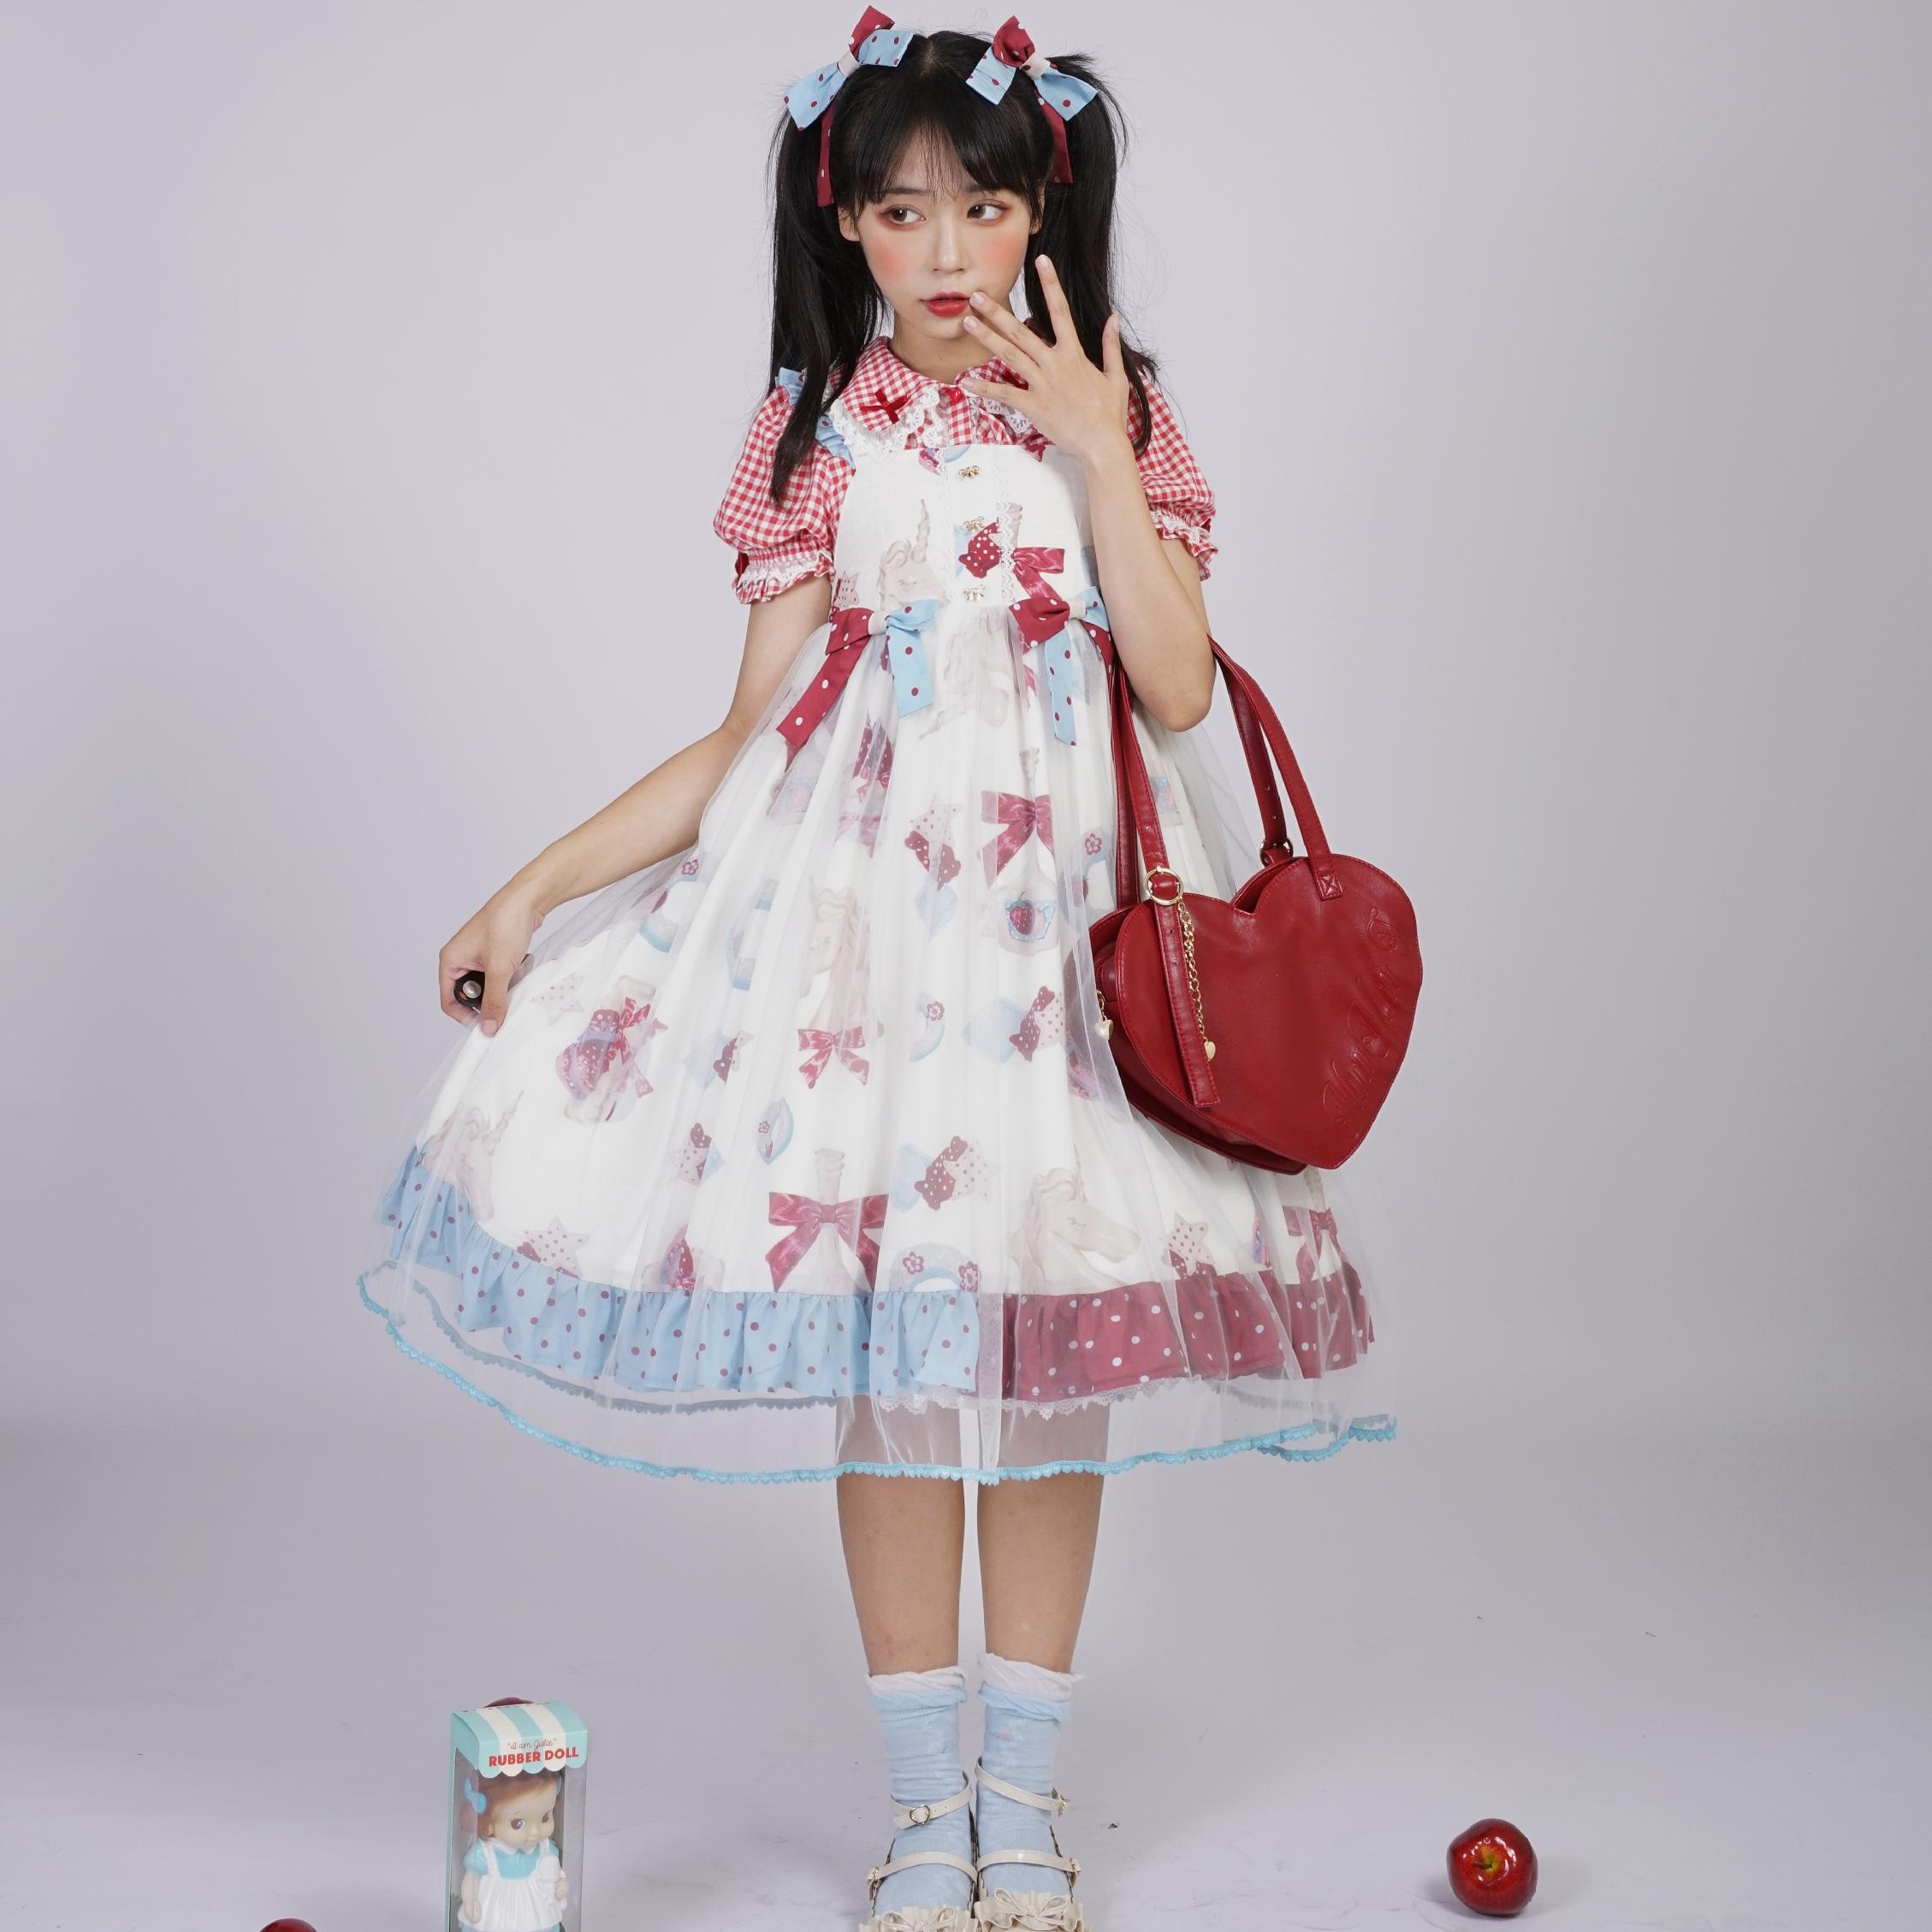 [curvy horse head] [full stock] Galaxy Lolita Dress lovely girl dress Lolita